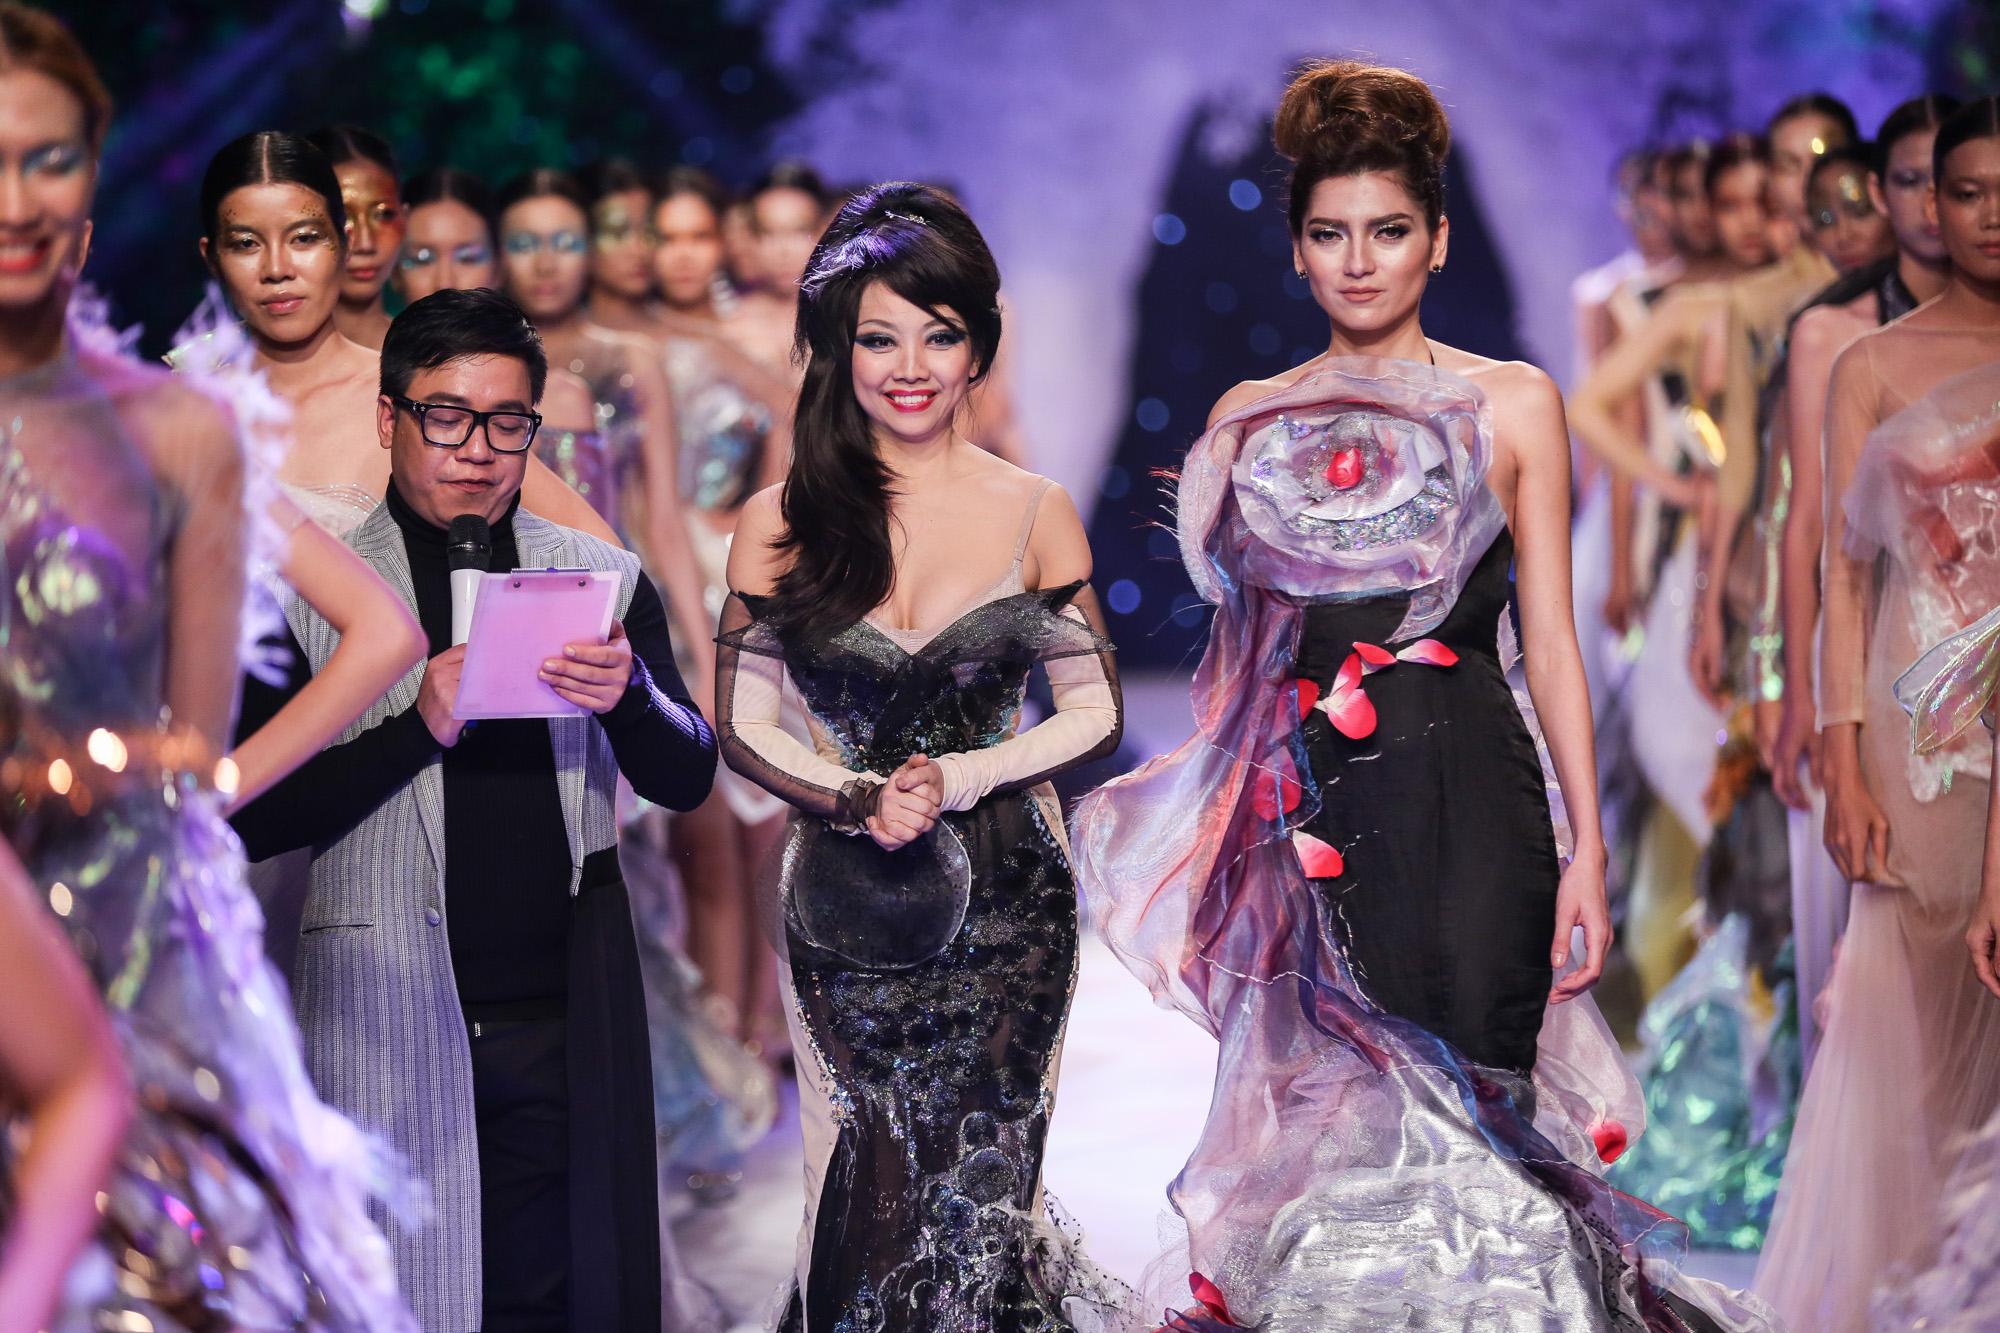 Quỳnh Paris Deja Vu show - elle vietnam 12